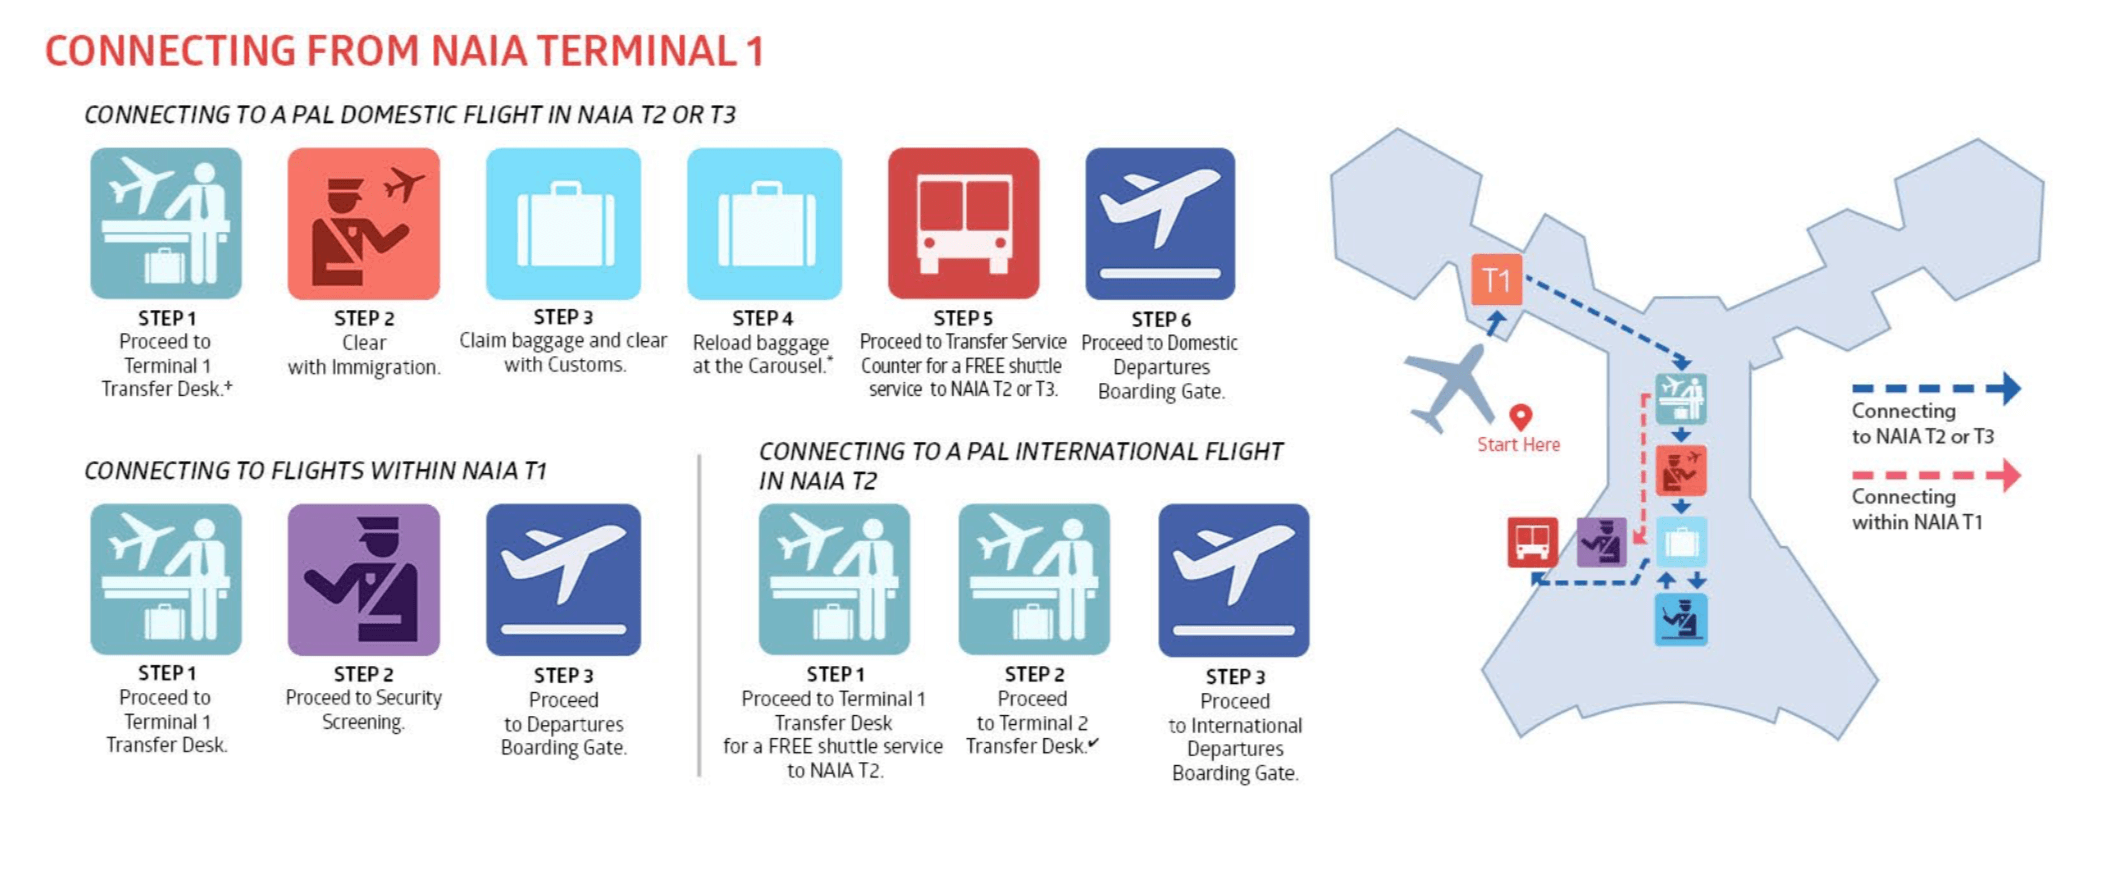 Anschluss vom NAIA Terminal 1